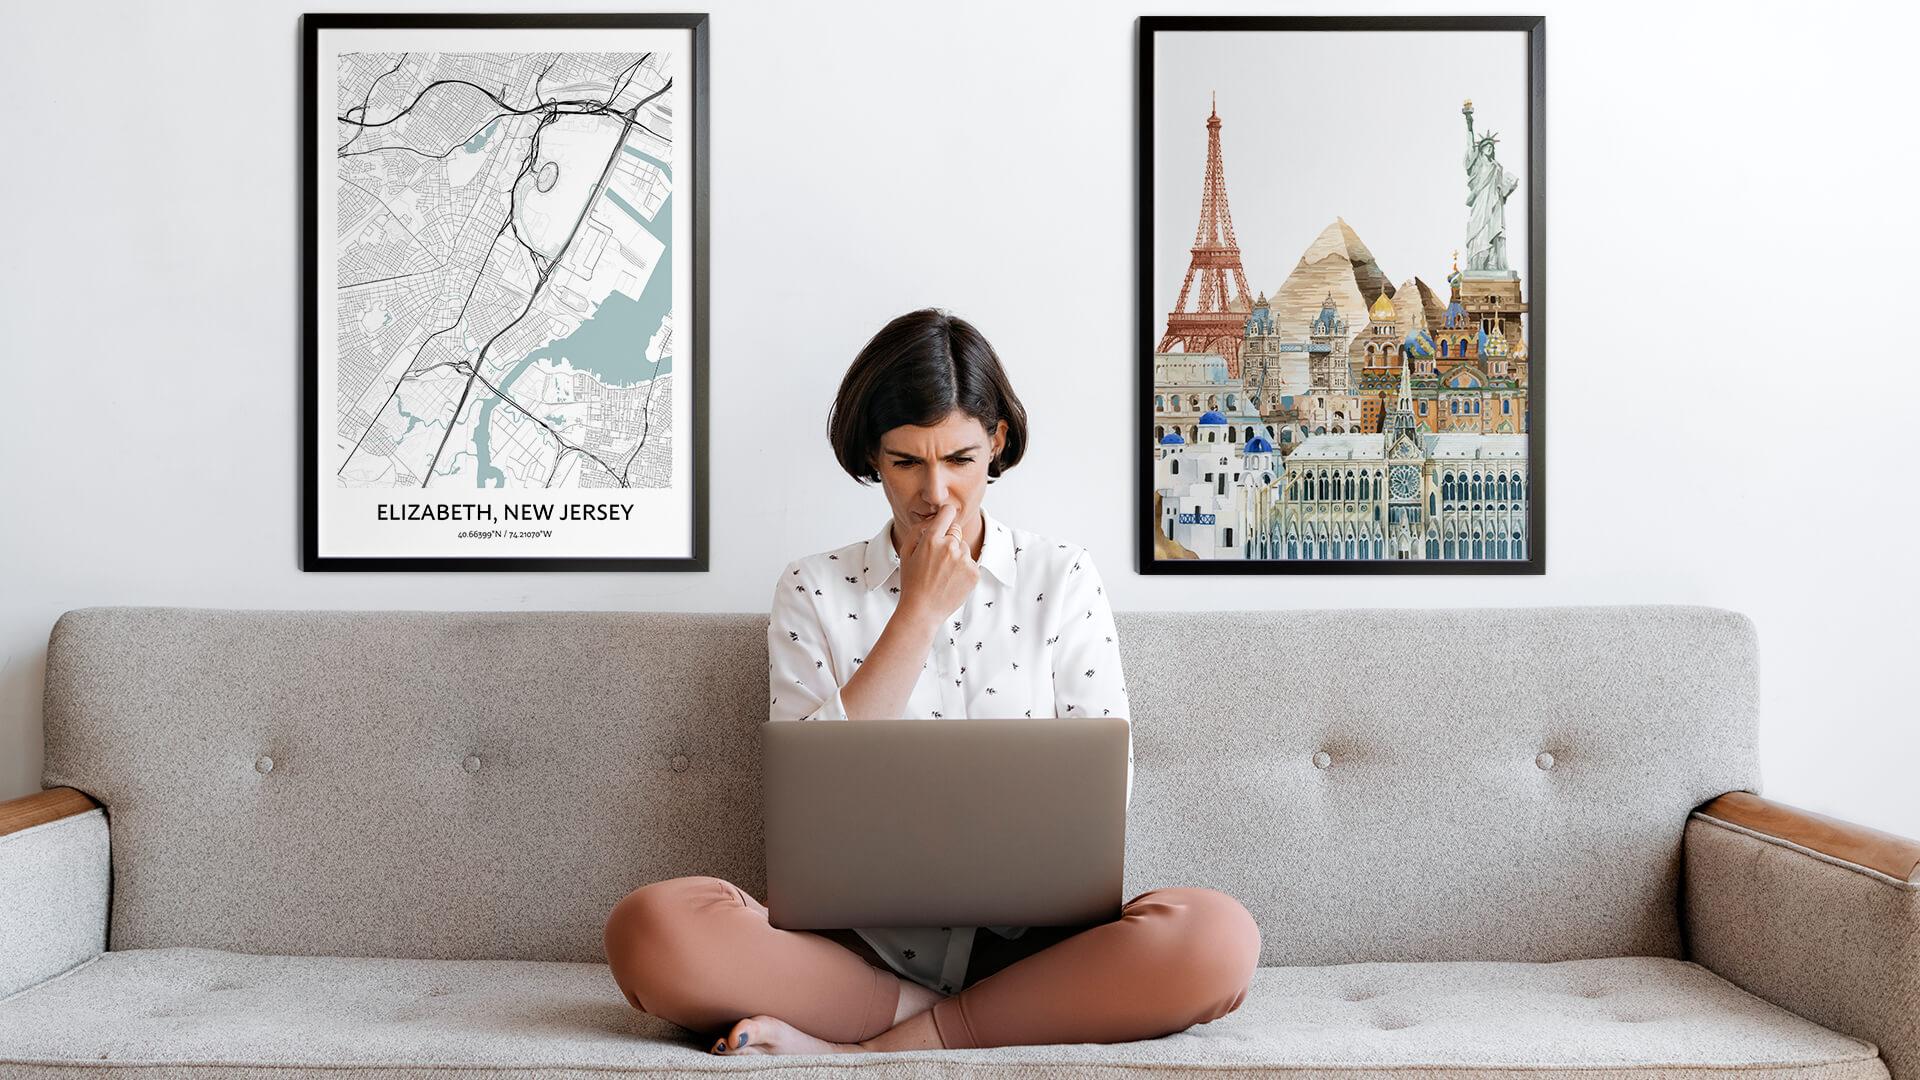 Elizabeth city map art